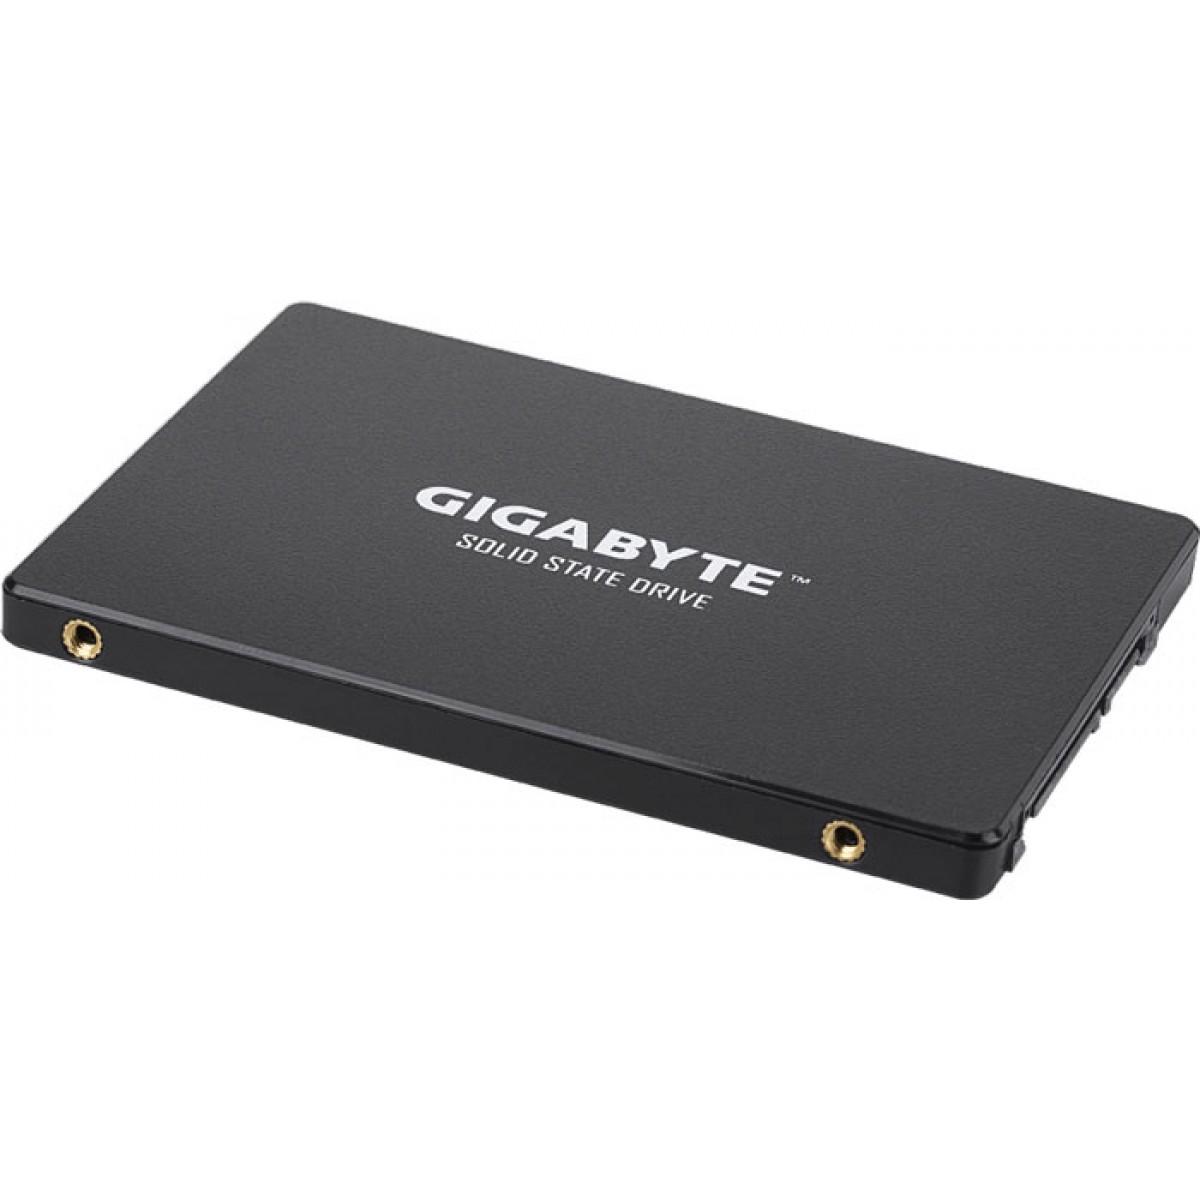 SSD Gigabyte, 256GB, Sata III, Leitura 520MBs e Gravação 500MBs, GP-GSTFS31256GTND